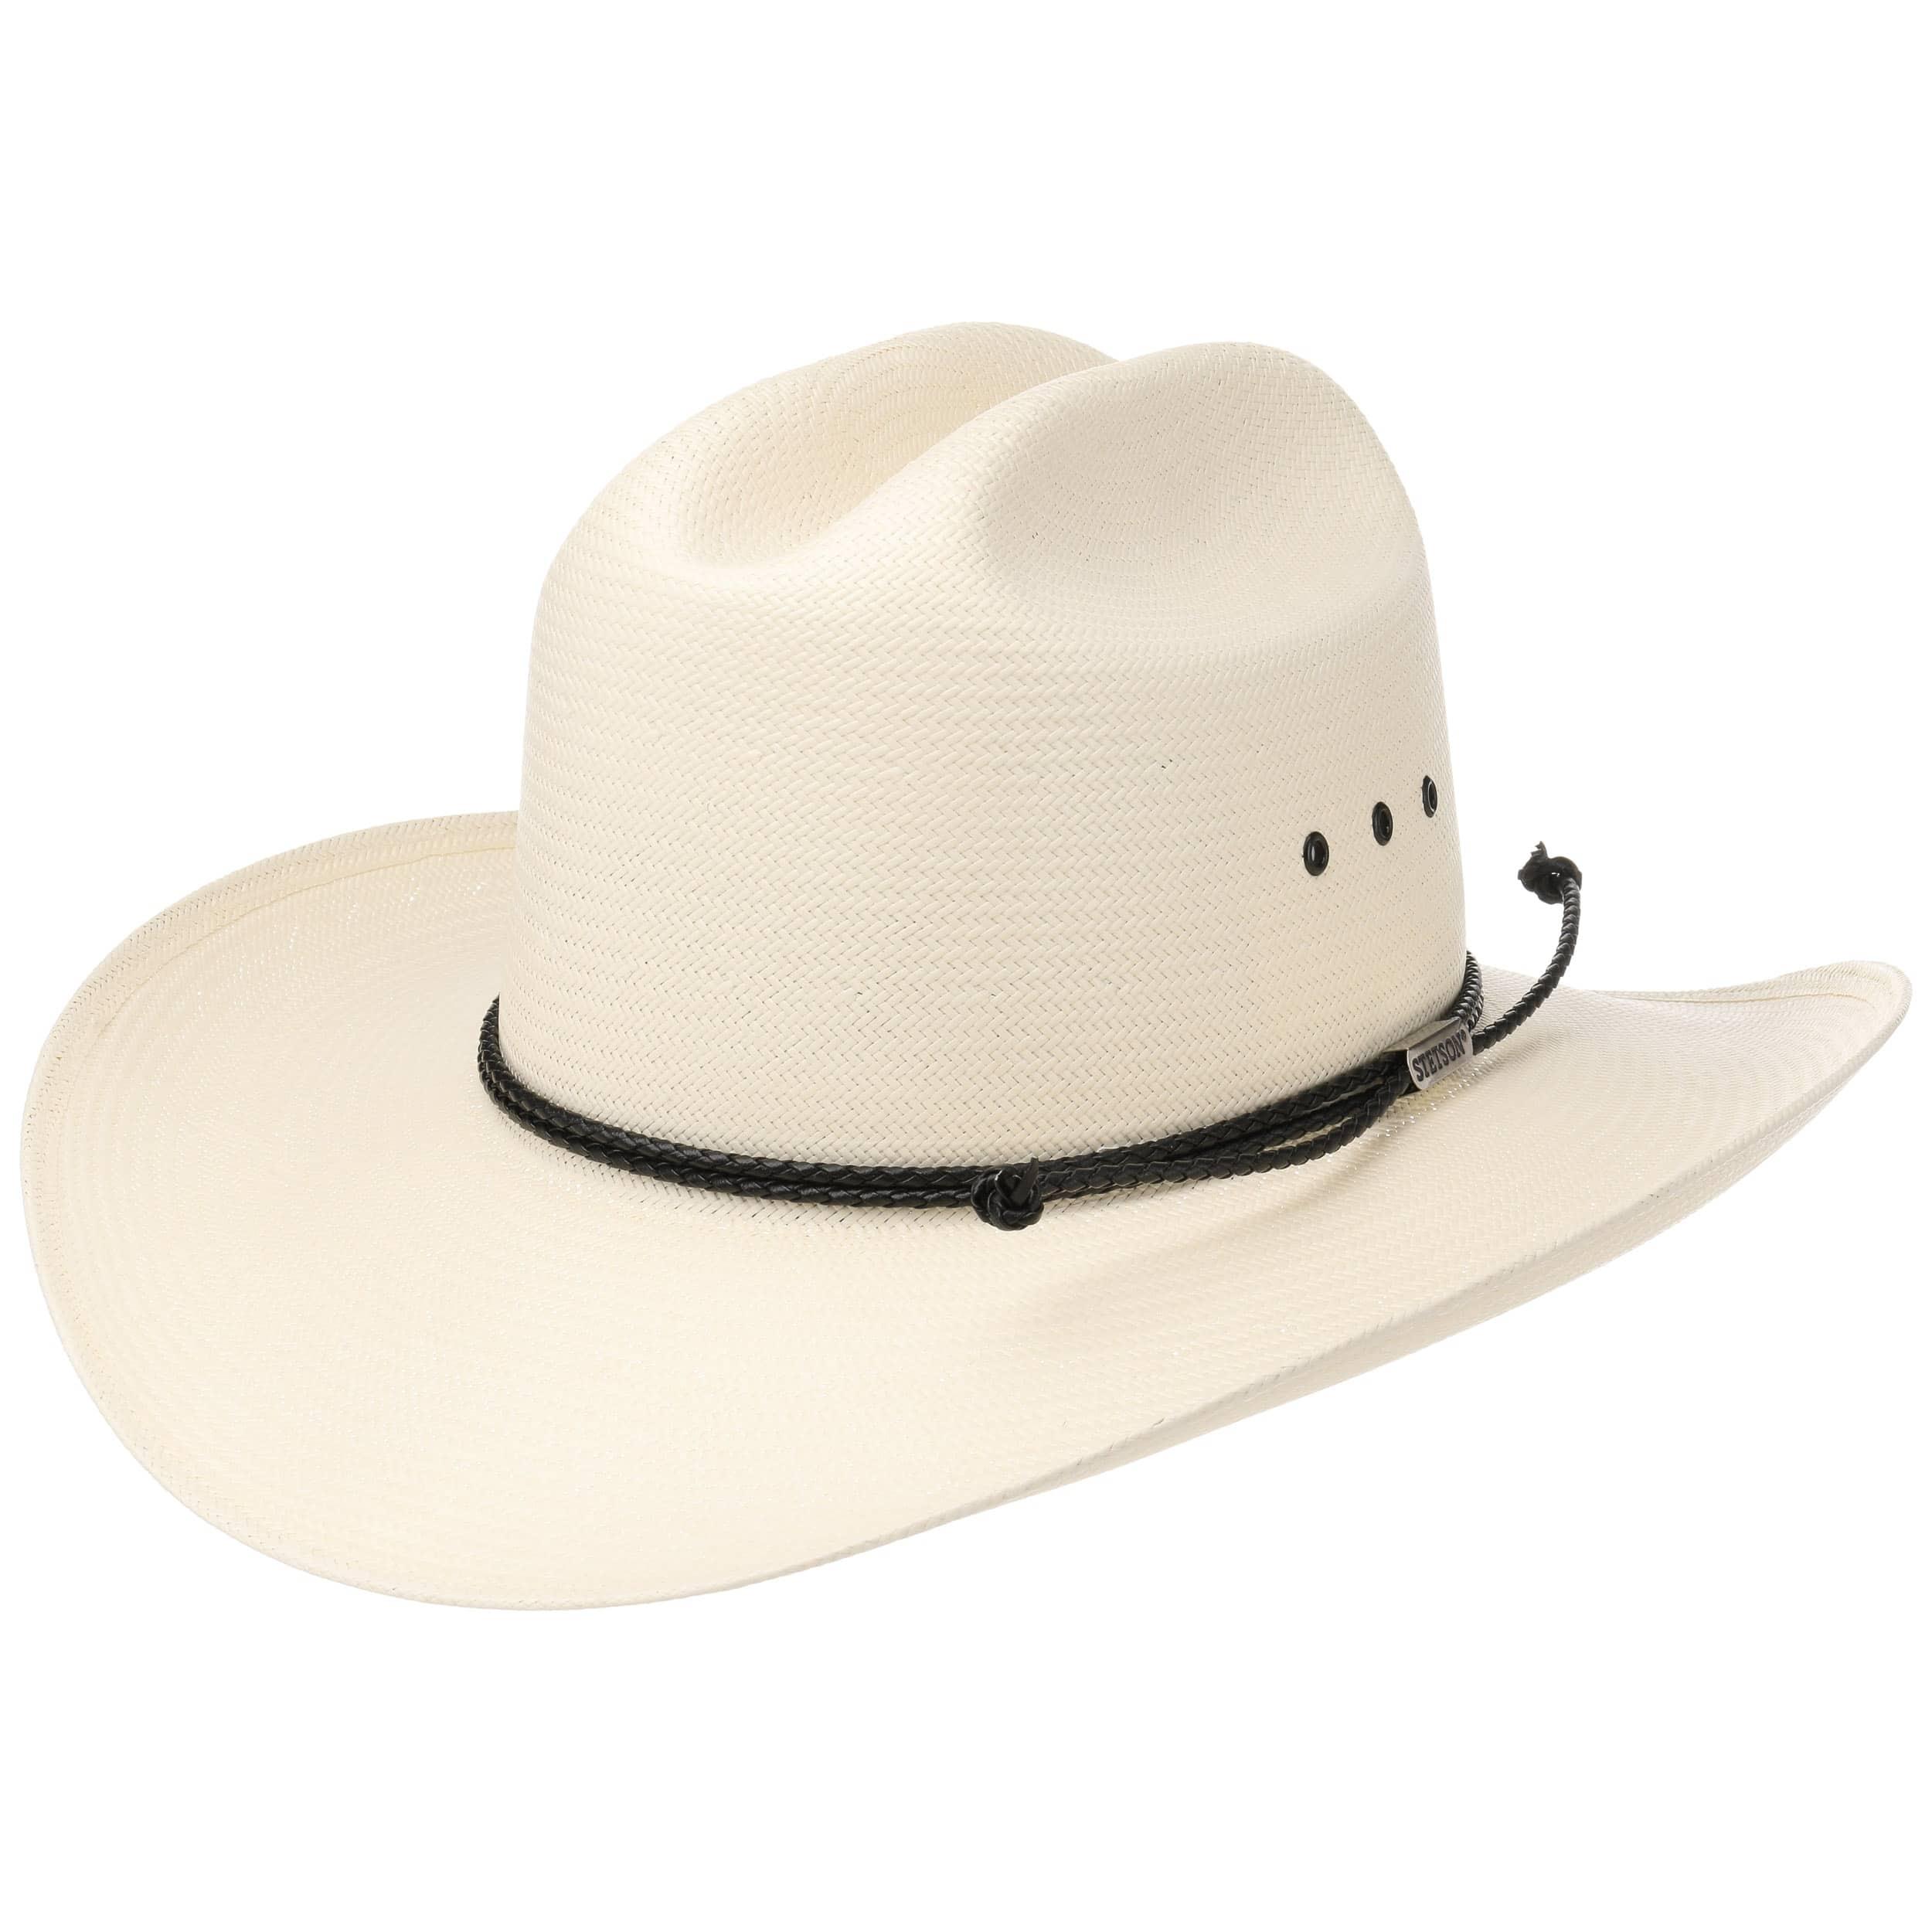 ... Sombrero de Paja Oeste Comfort 10X by Stetson - blanco crema 5 30b754b84f8